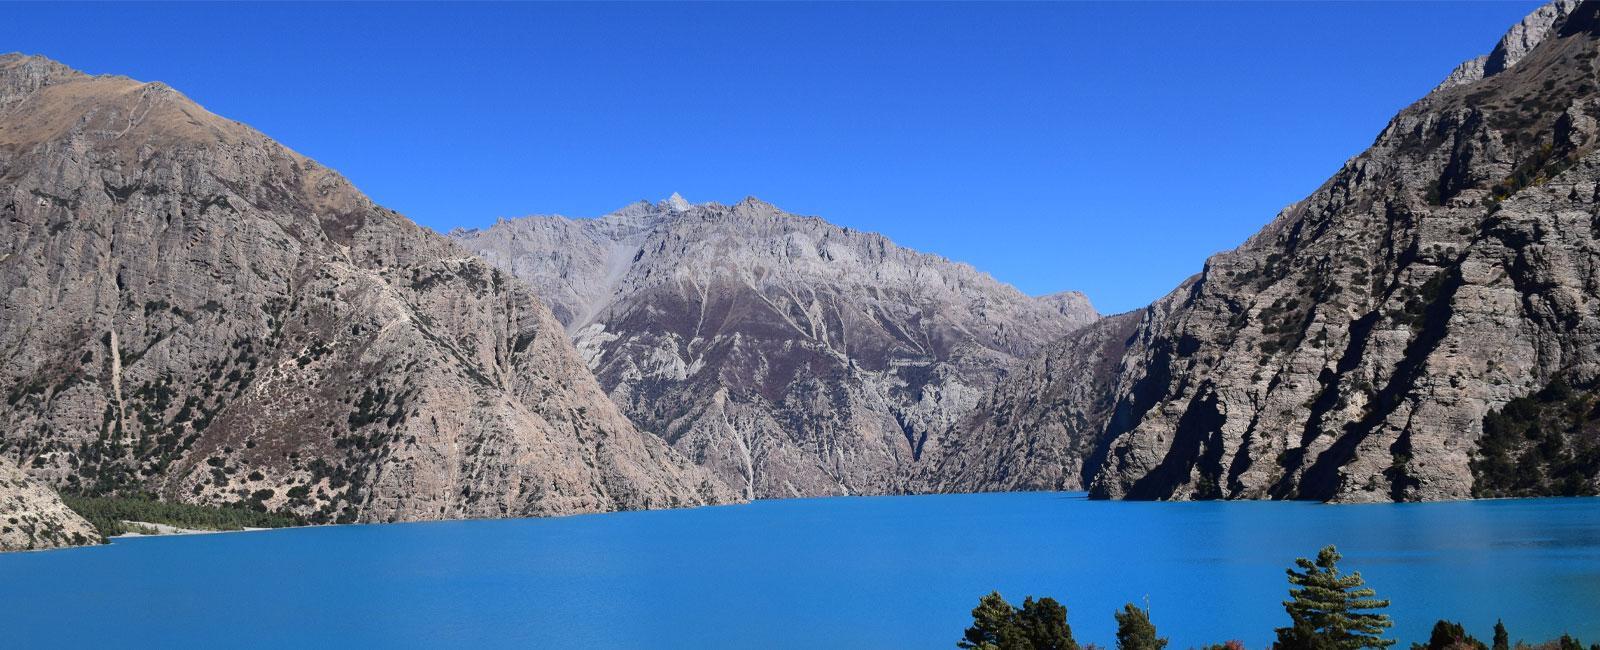 Nepal Special Area Trekking